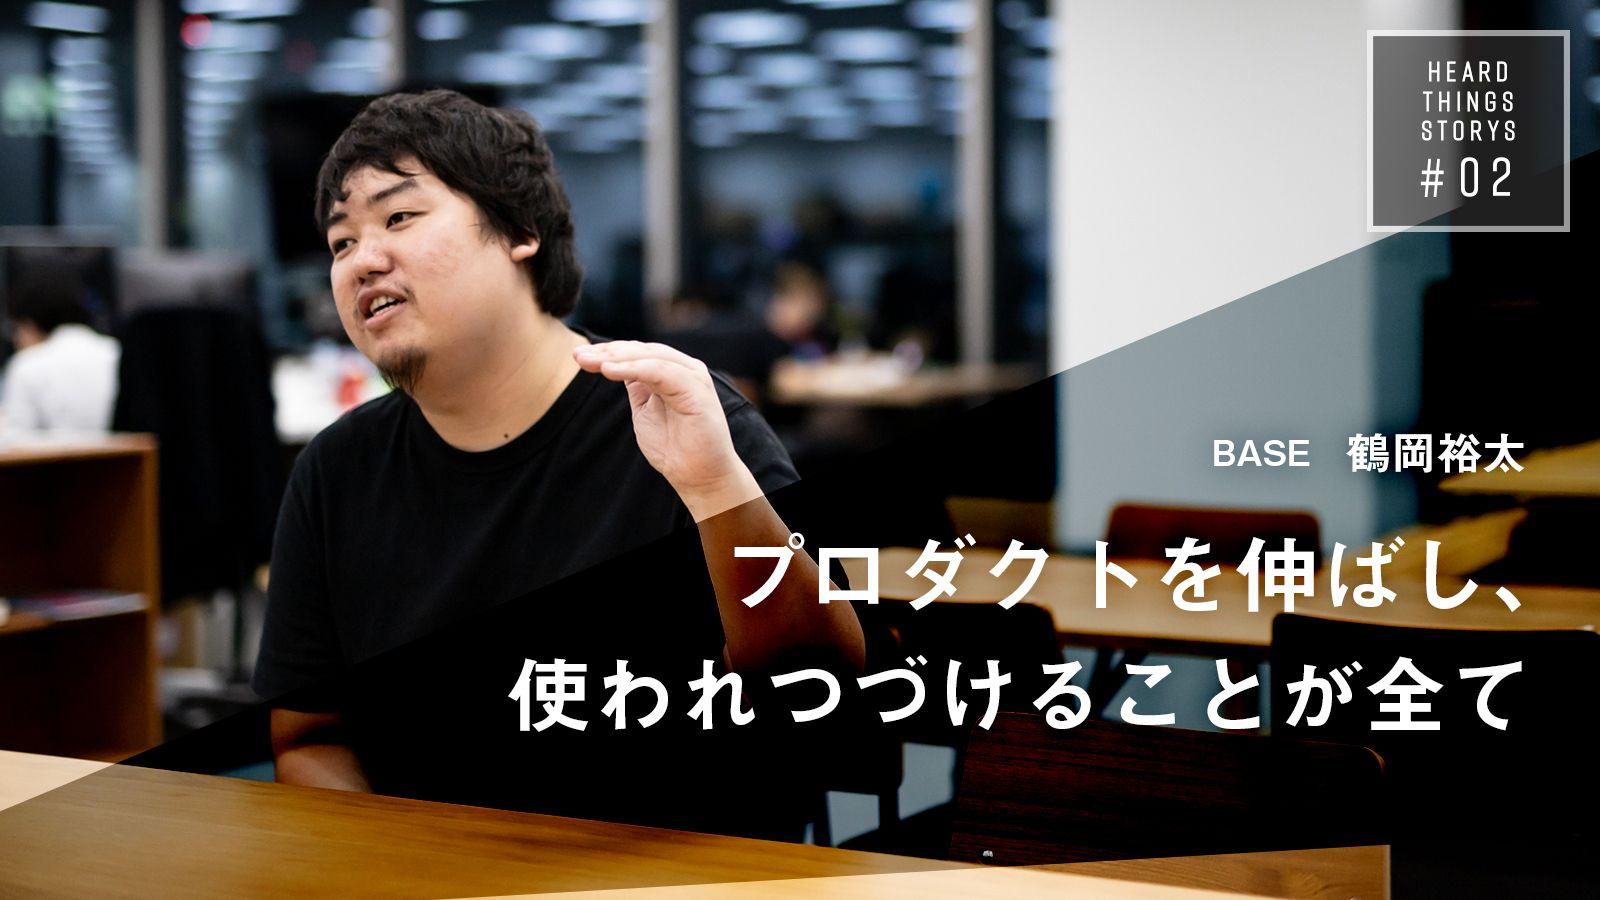 BASE 鶴岡裕太の回顧録「サービスは好調なのに、仲間が去ってしまった」